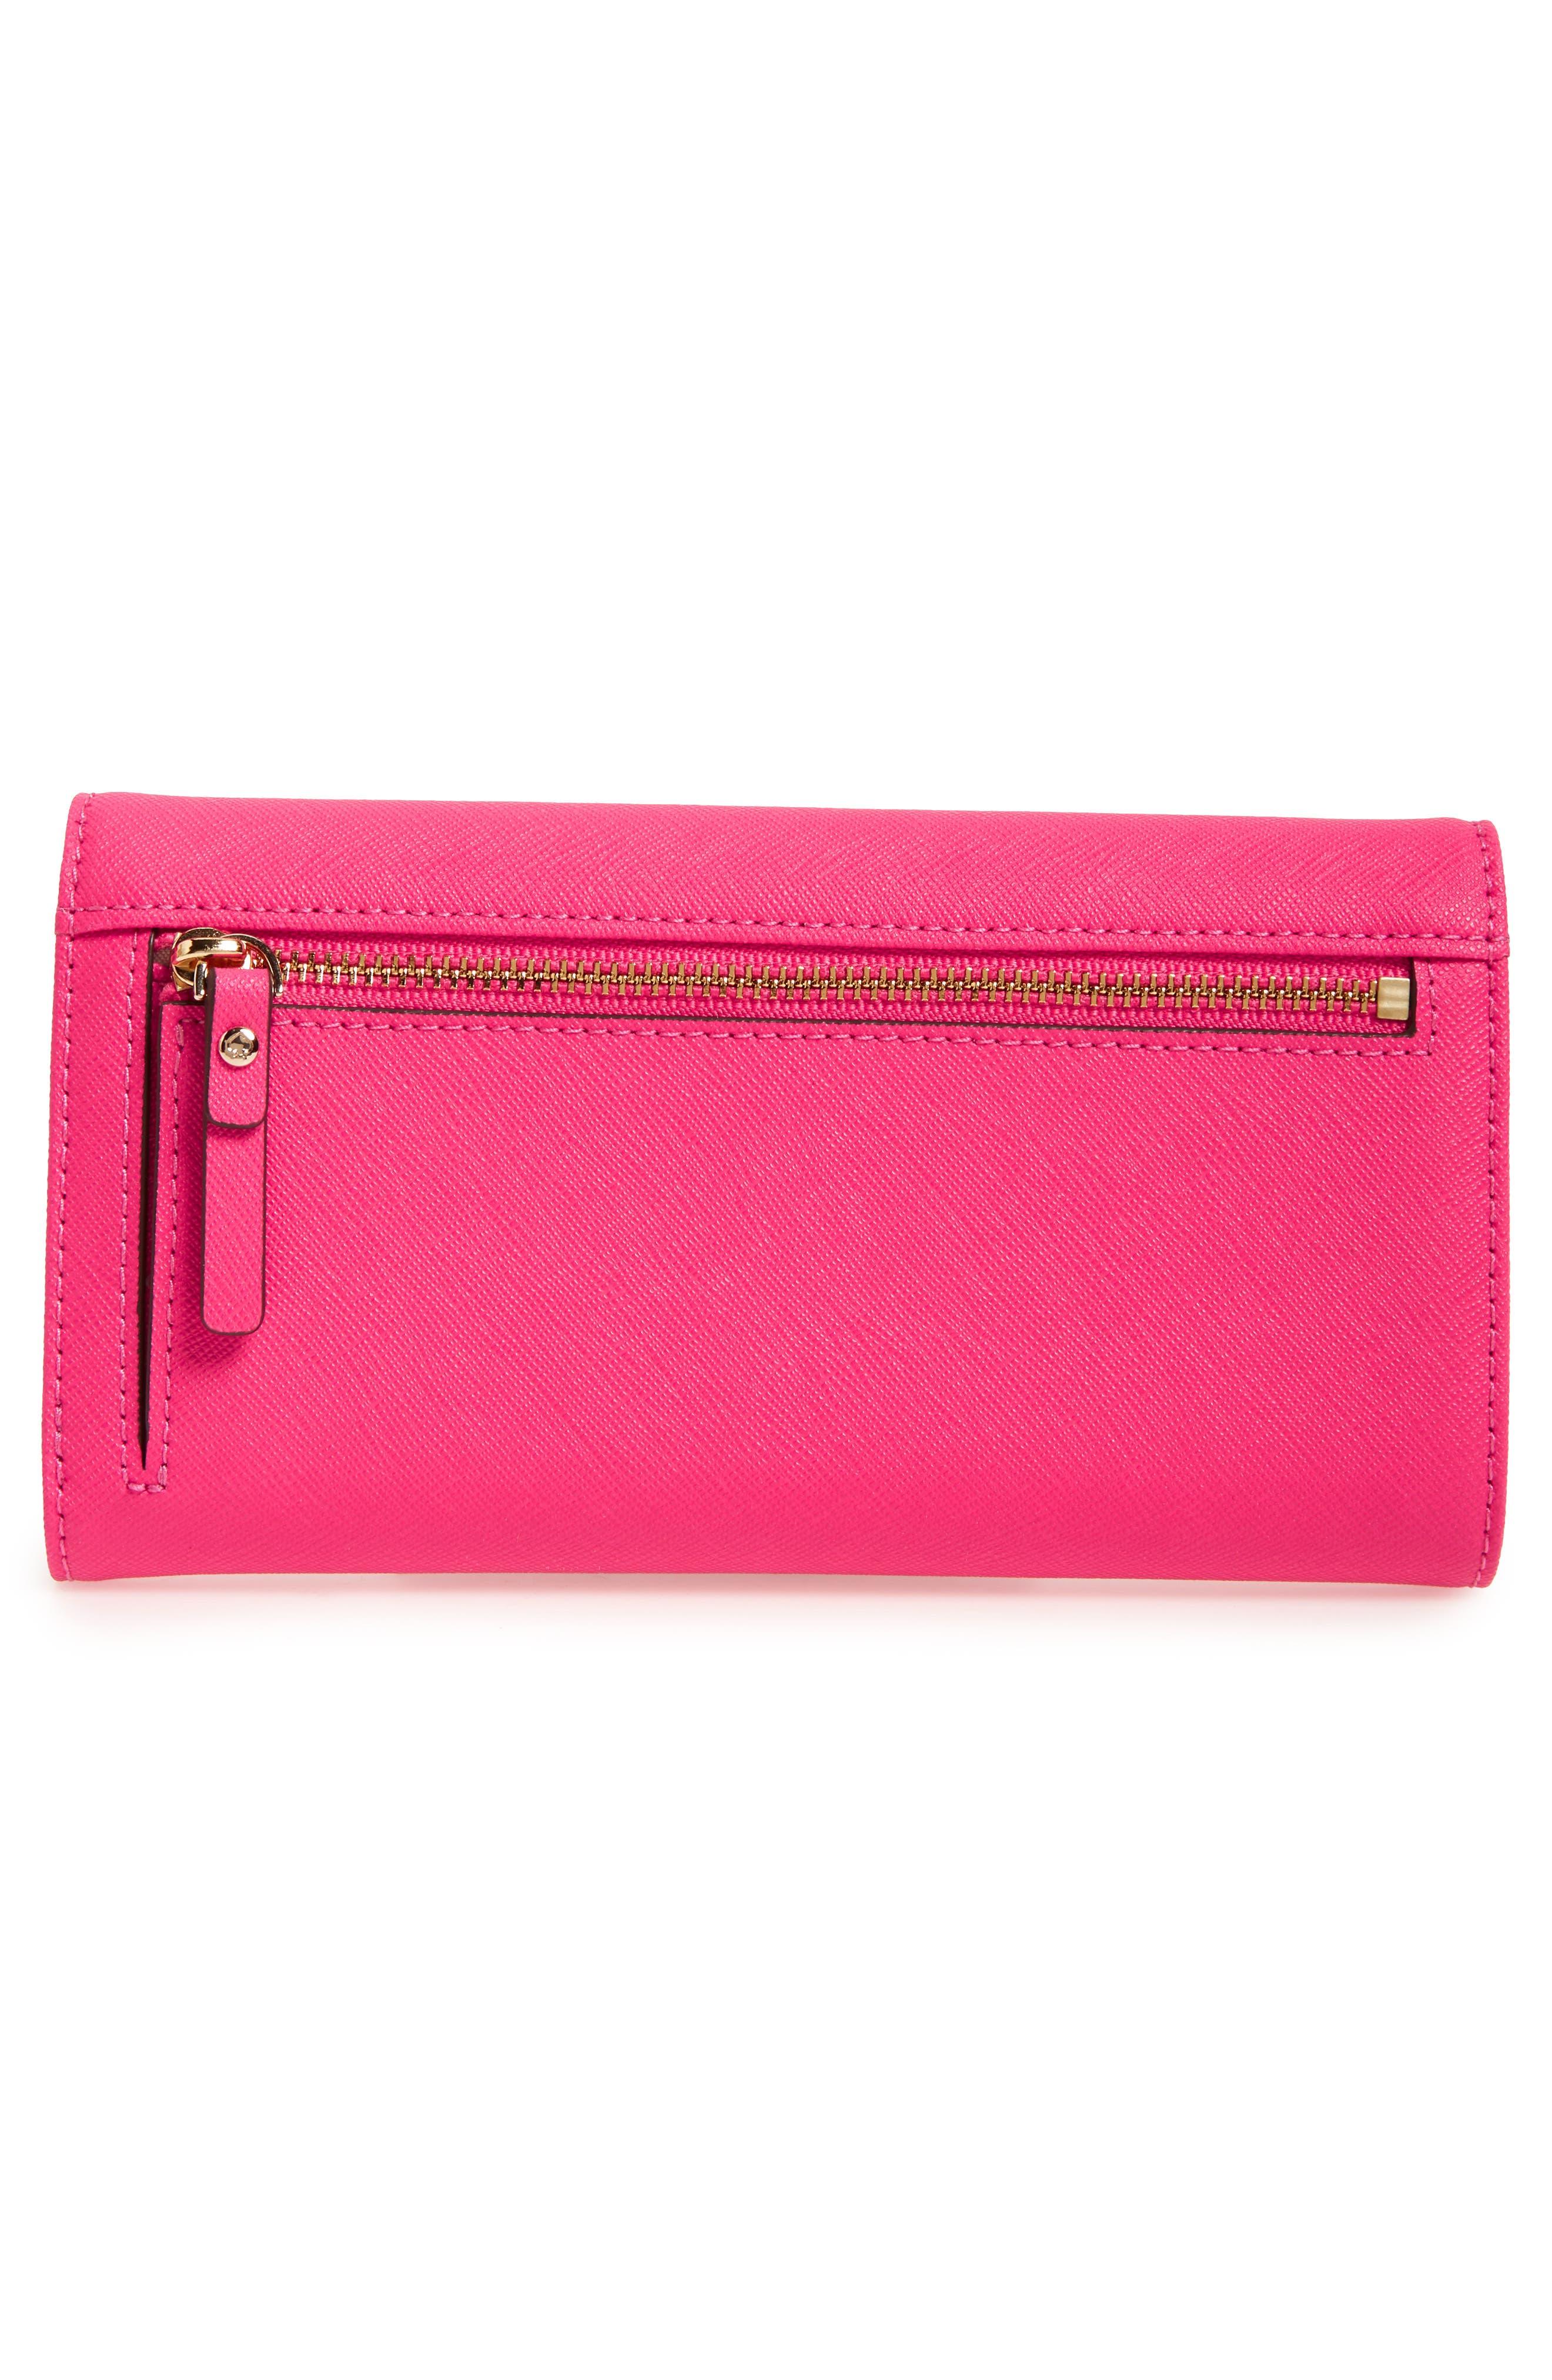 leather iPhone 7/8 & 7/8 Plus case,                             Alternate thumbnail 31, color,